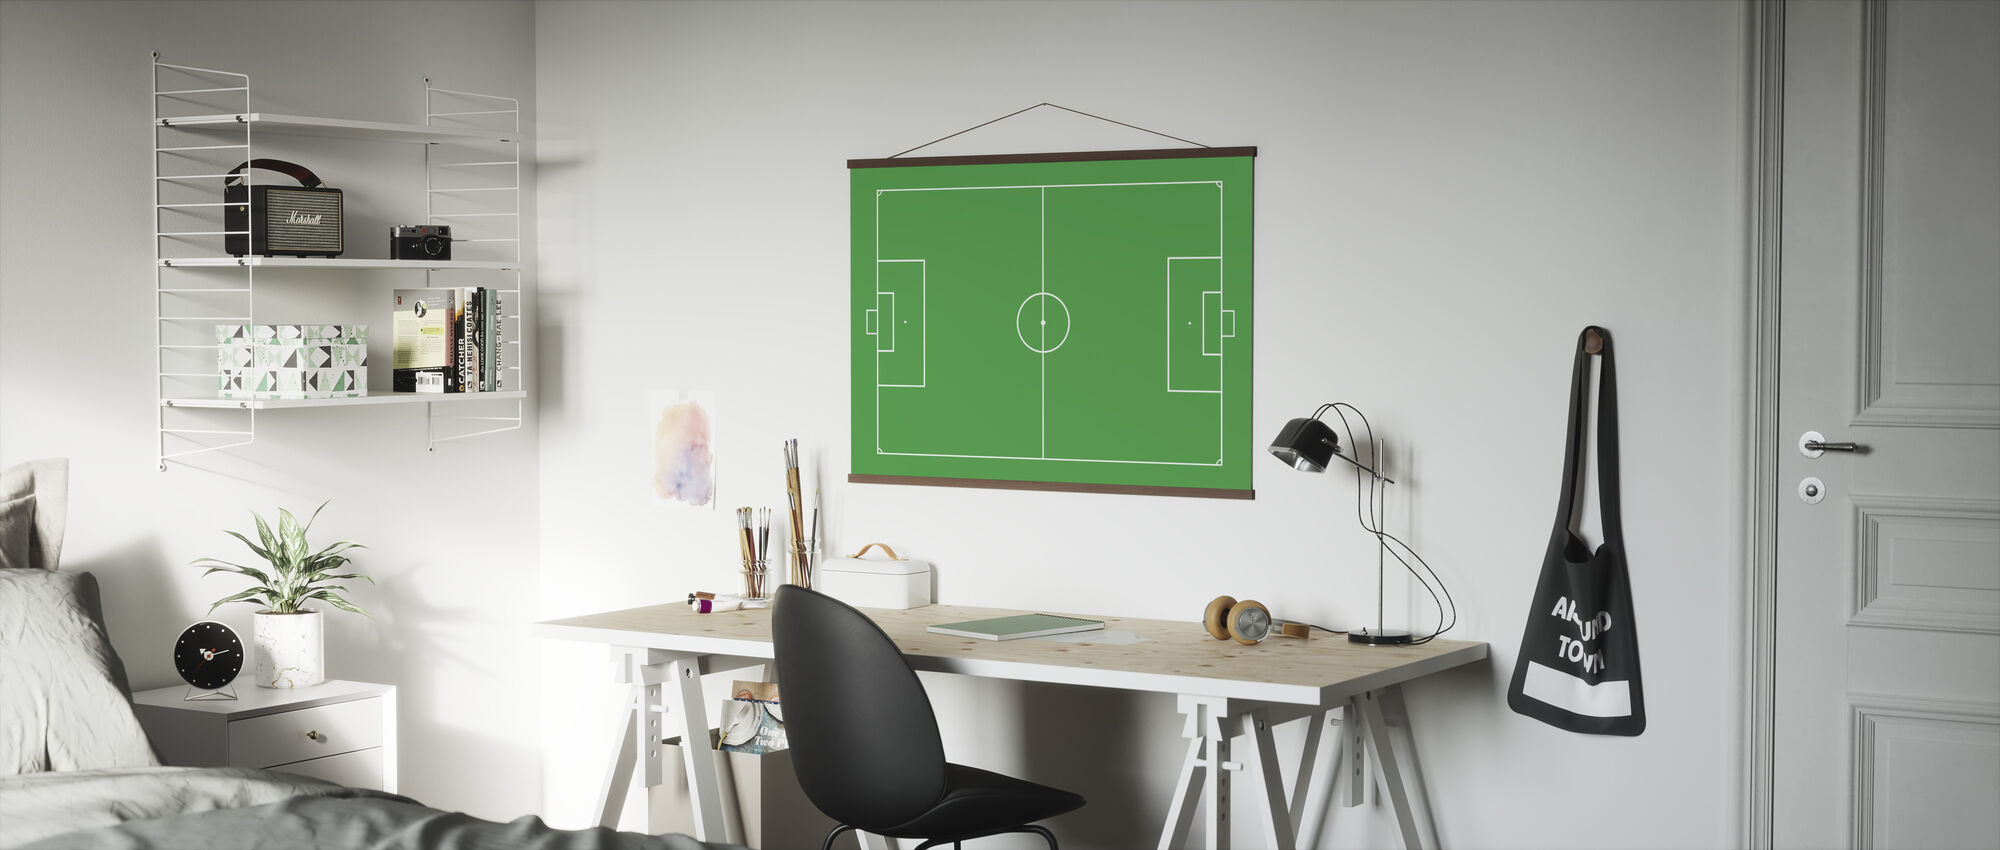 Fodbold felt - Plakat - Kontor